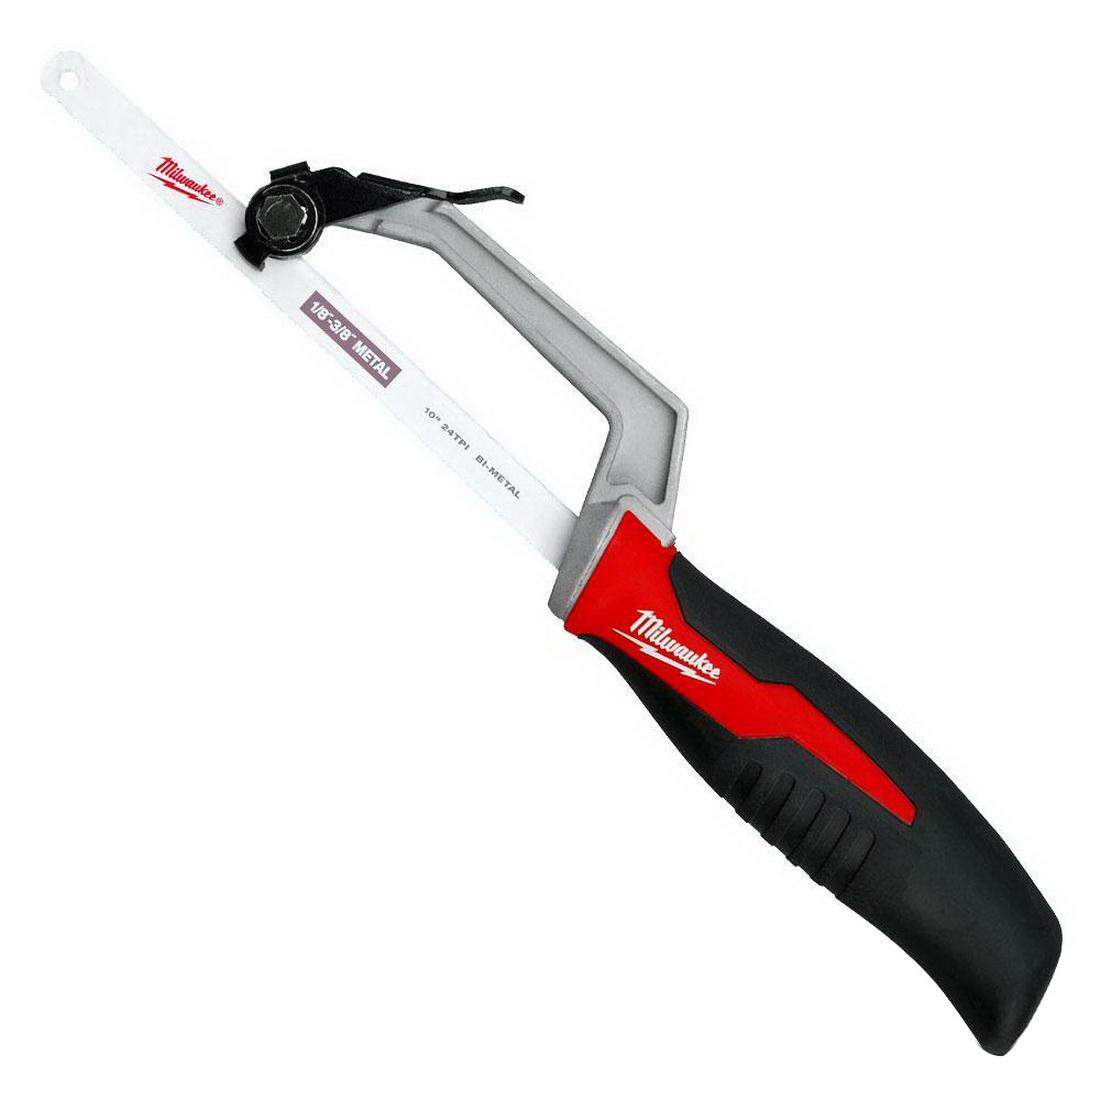 Compact Hacksaw Blade 10 inch